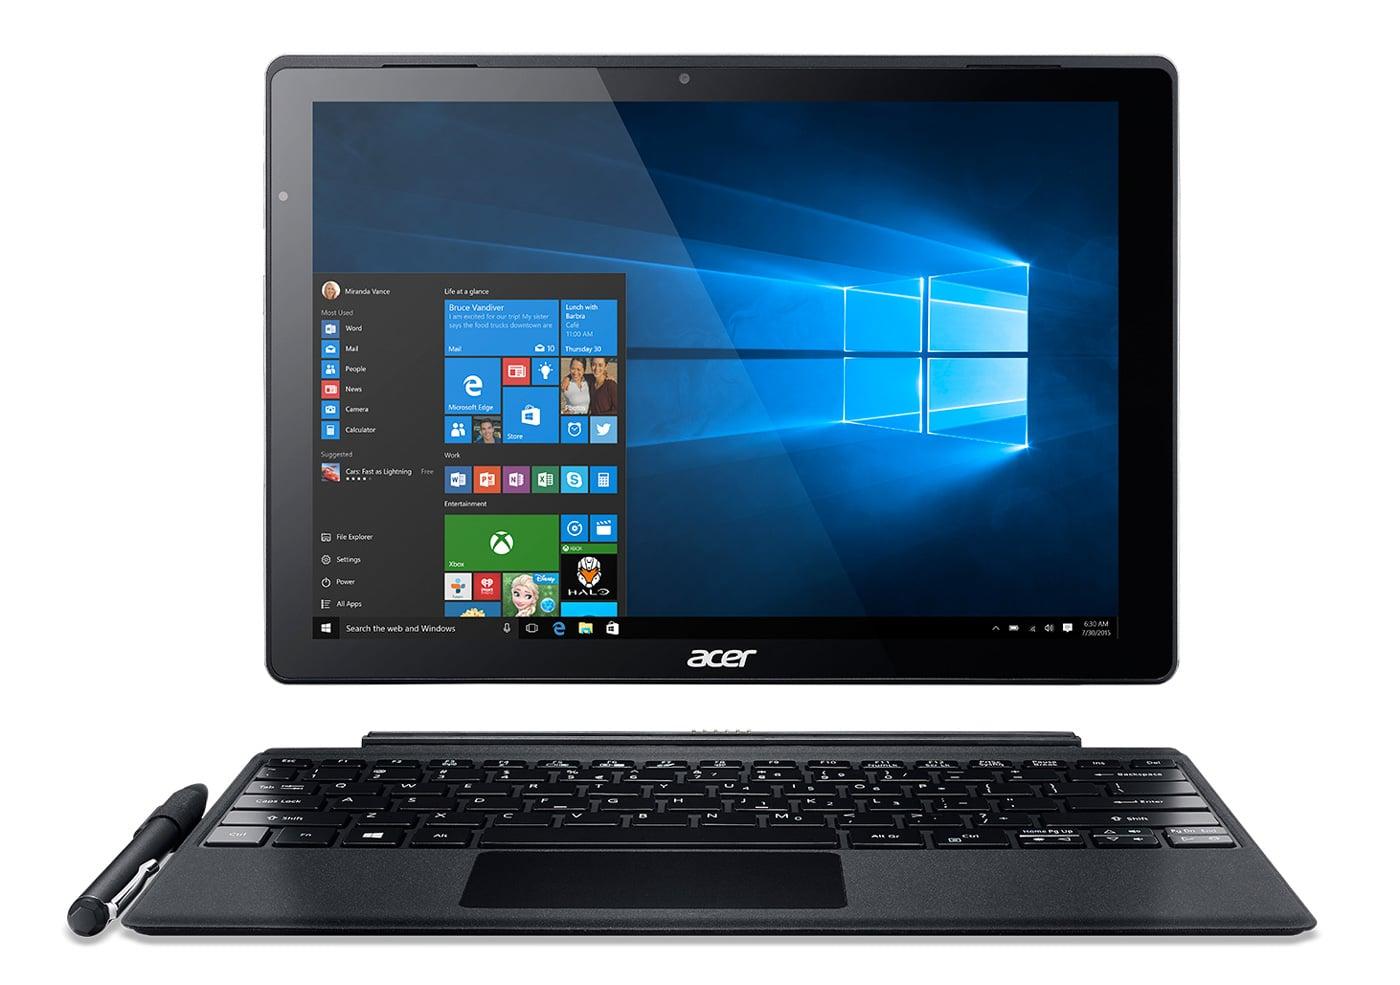 "Acer Switch Alpha SA5-271-39QM, ultrabook/tablette 12"" SSD i3 QHD promo 699€"